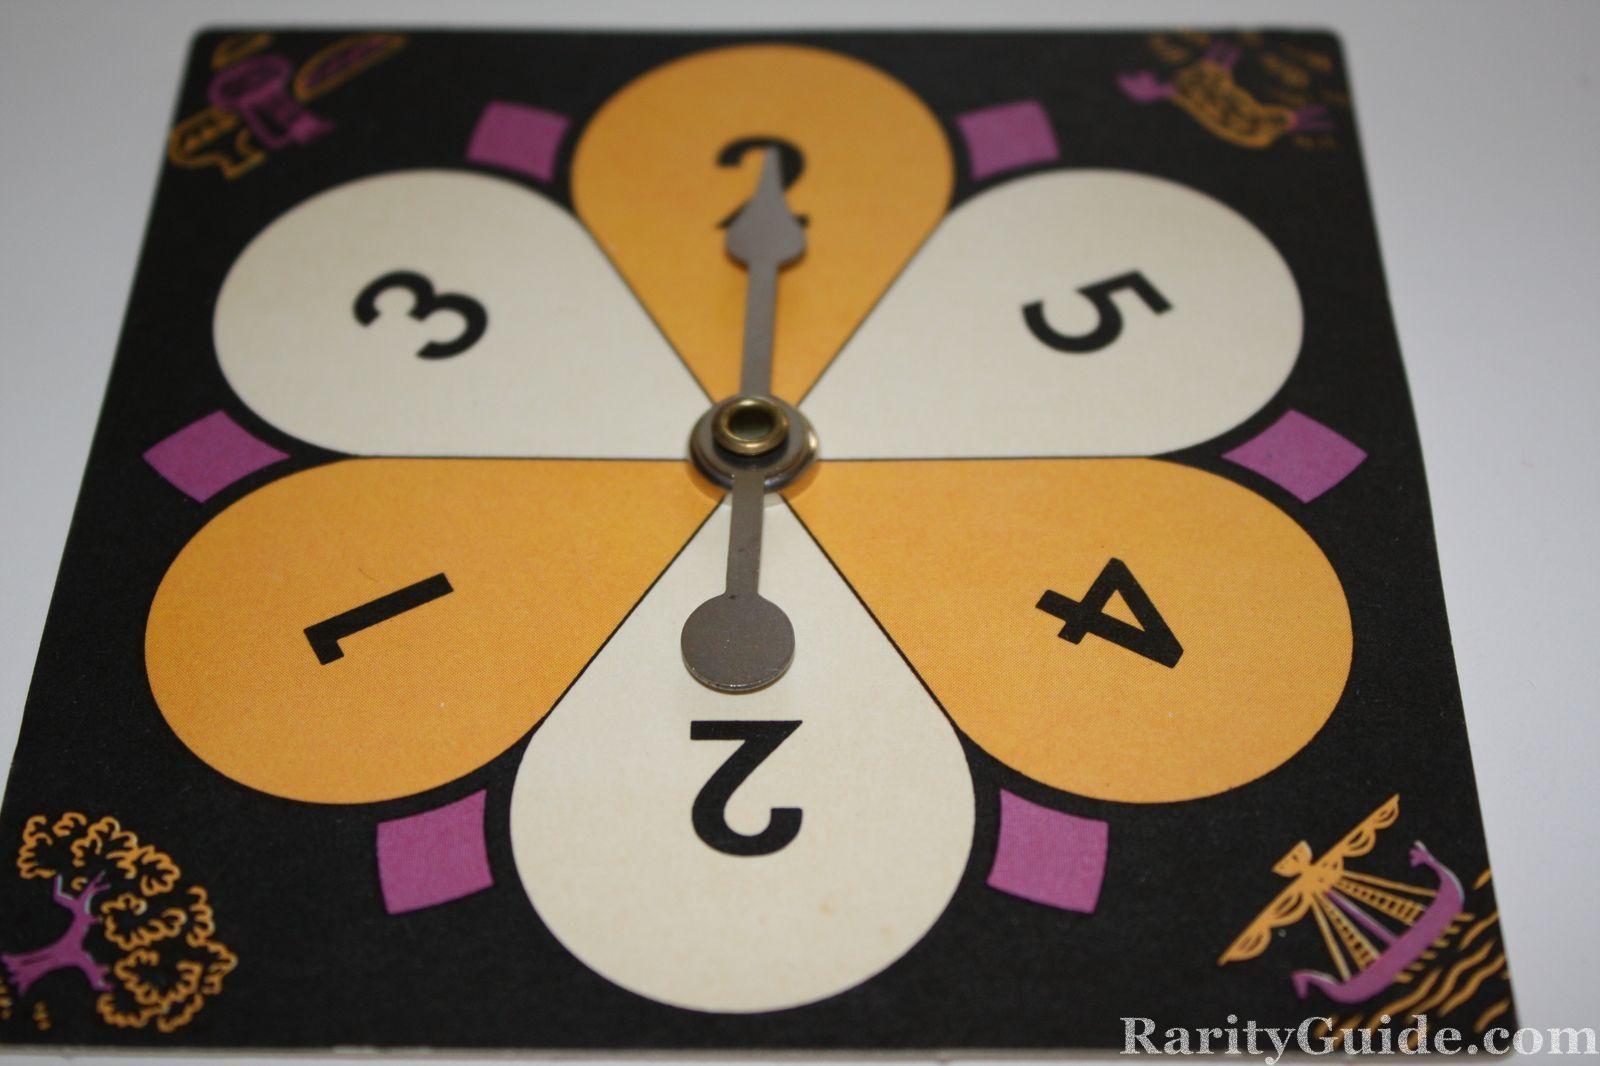 Rarityguide Com Museum Card And Board Games Ten